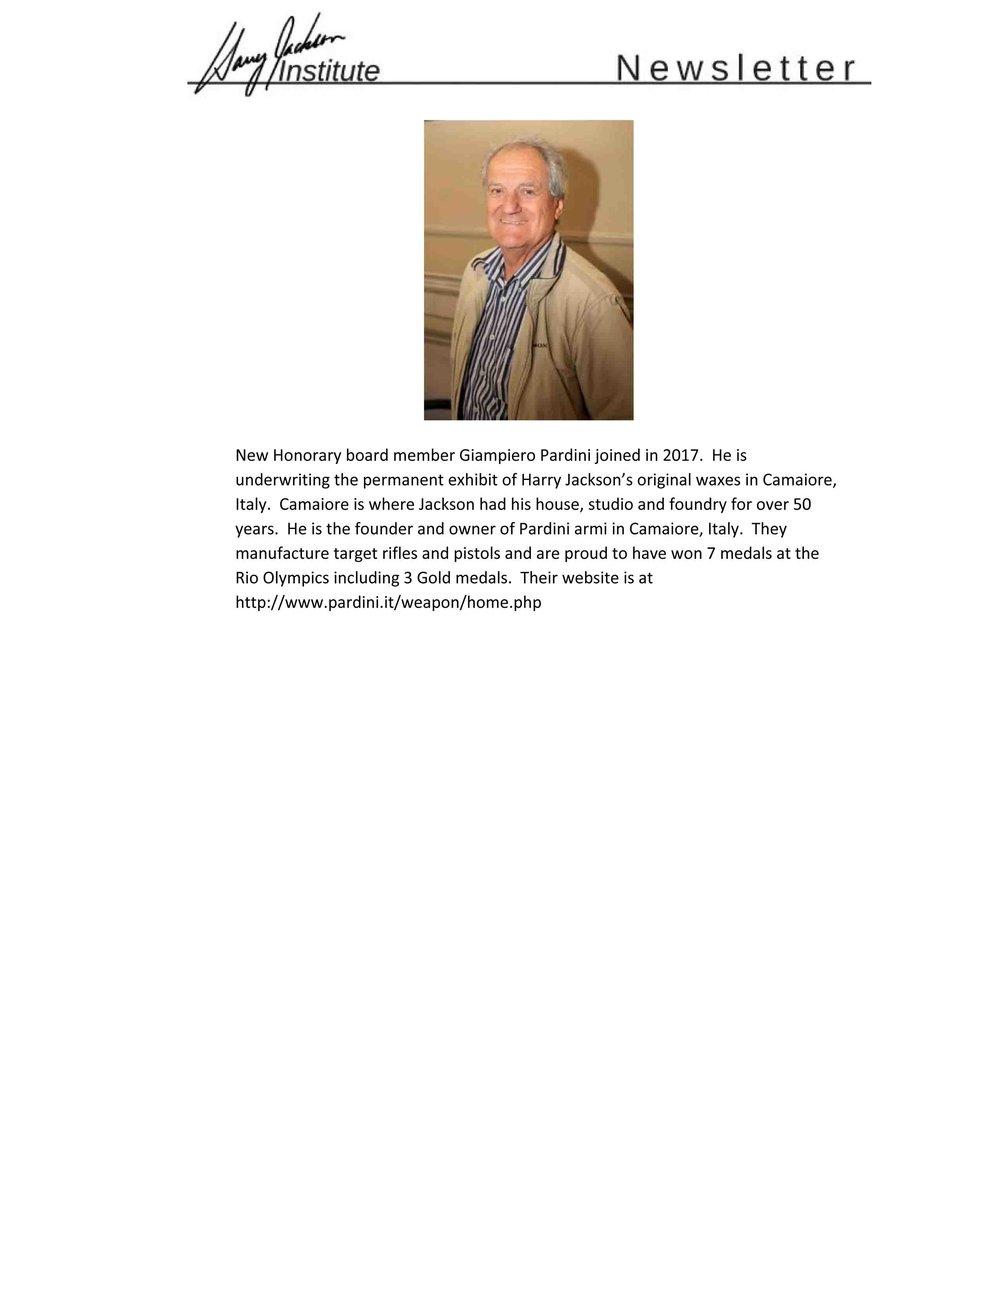 2017_10_01 Harry Jackson Iinstitute Newsletter-6.jpg